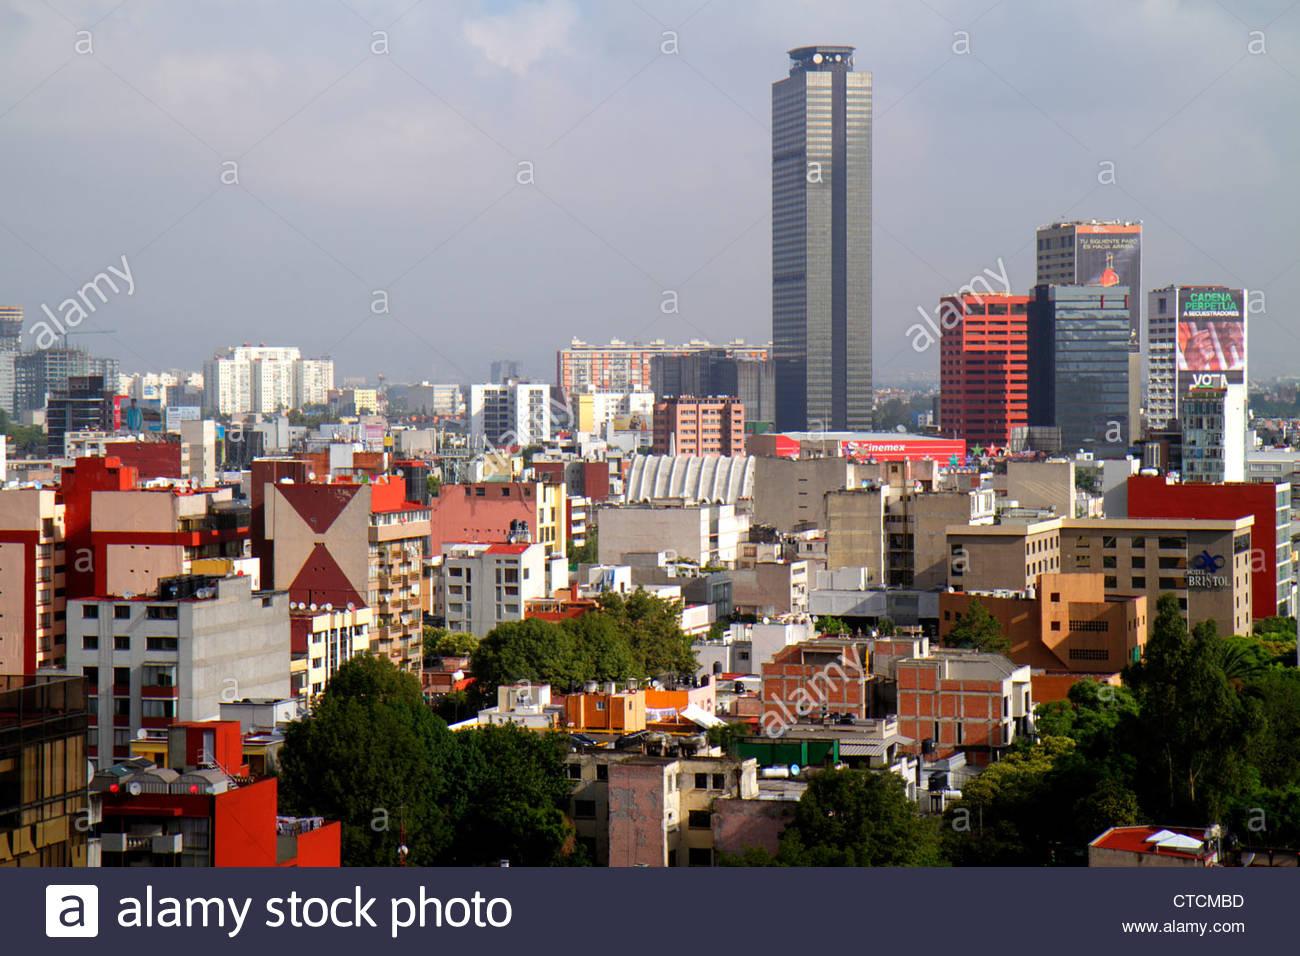 Mexico City Mexico DF D.F. Ciudad de México Federal District Distrito Federal Juarez Doctores Benito Juarez - Stock Image